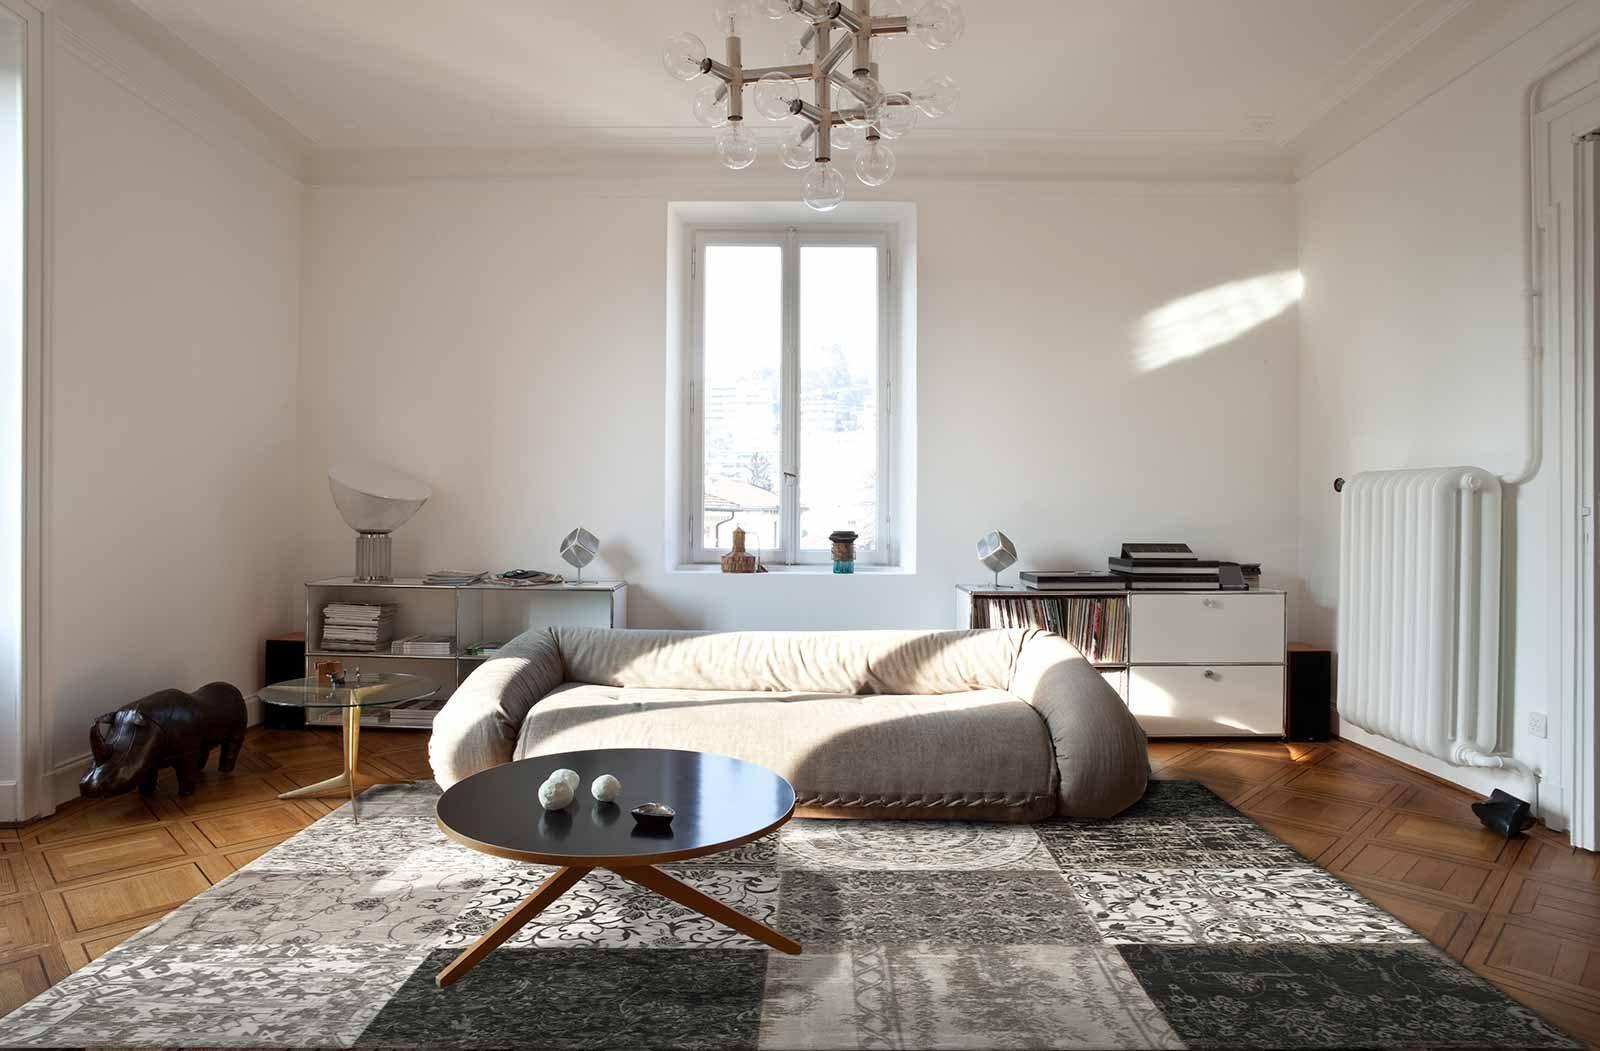 vloerkleed Louis De Poortere LX8101 Vintage Black White interior